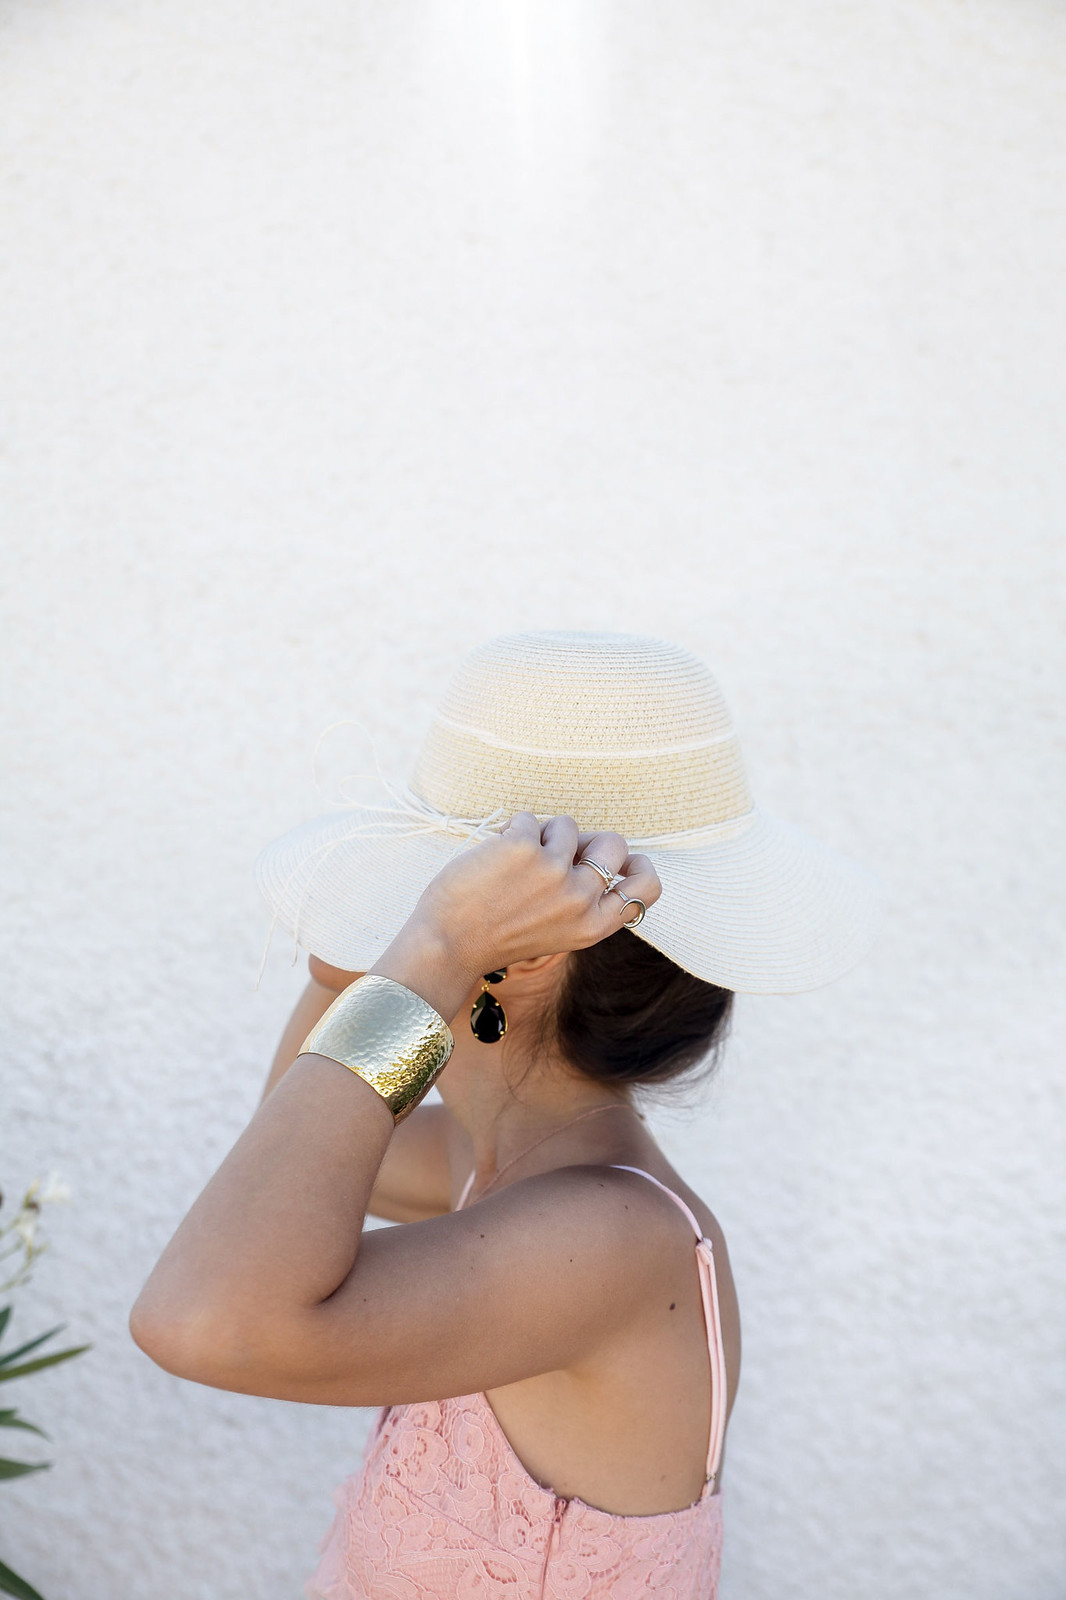 012_vestido_largo_rosa_para_verano_theguestgirl_influencer_noholita_collagevintage_sincerelyjules_ninauc_paulagonu_danity_paris_dress_ambassador_spain